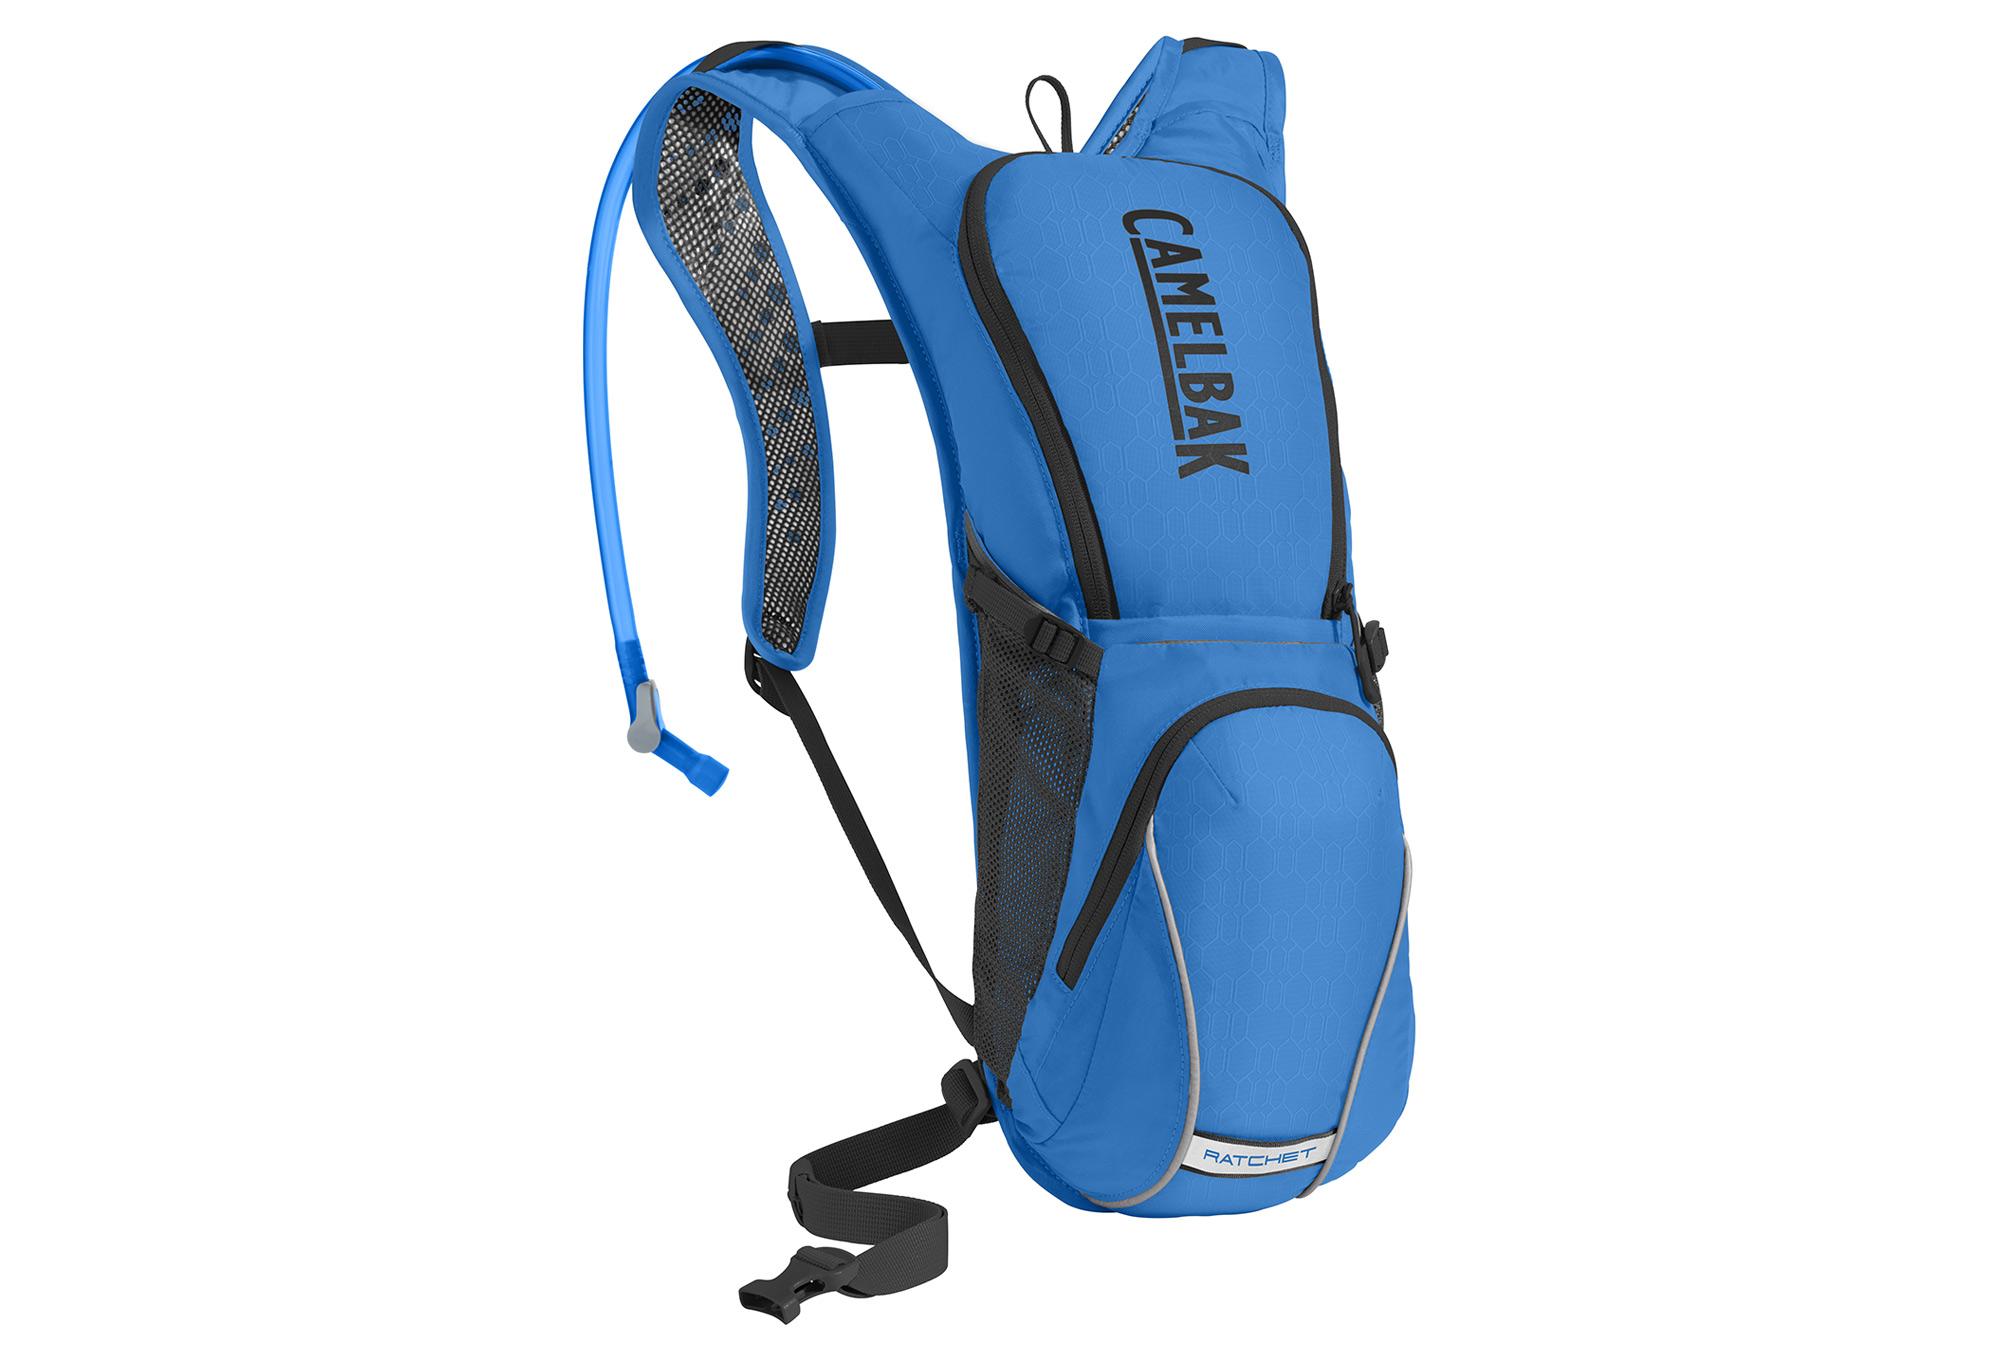 fb7b42e5d8a Camelbak Ratchet Hydration Backpack 3L Blue Black | Alltricks.com